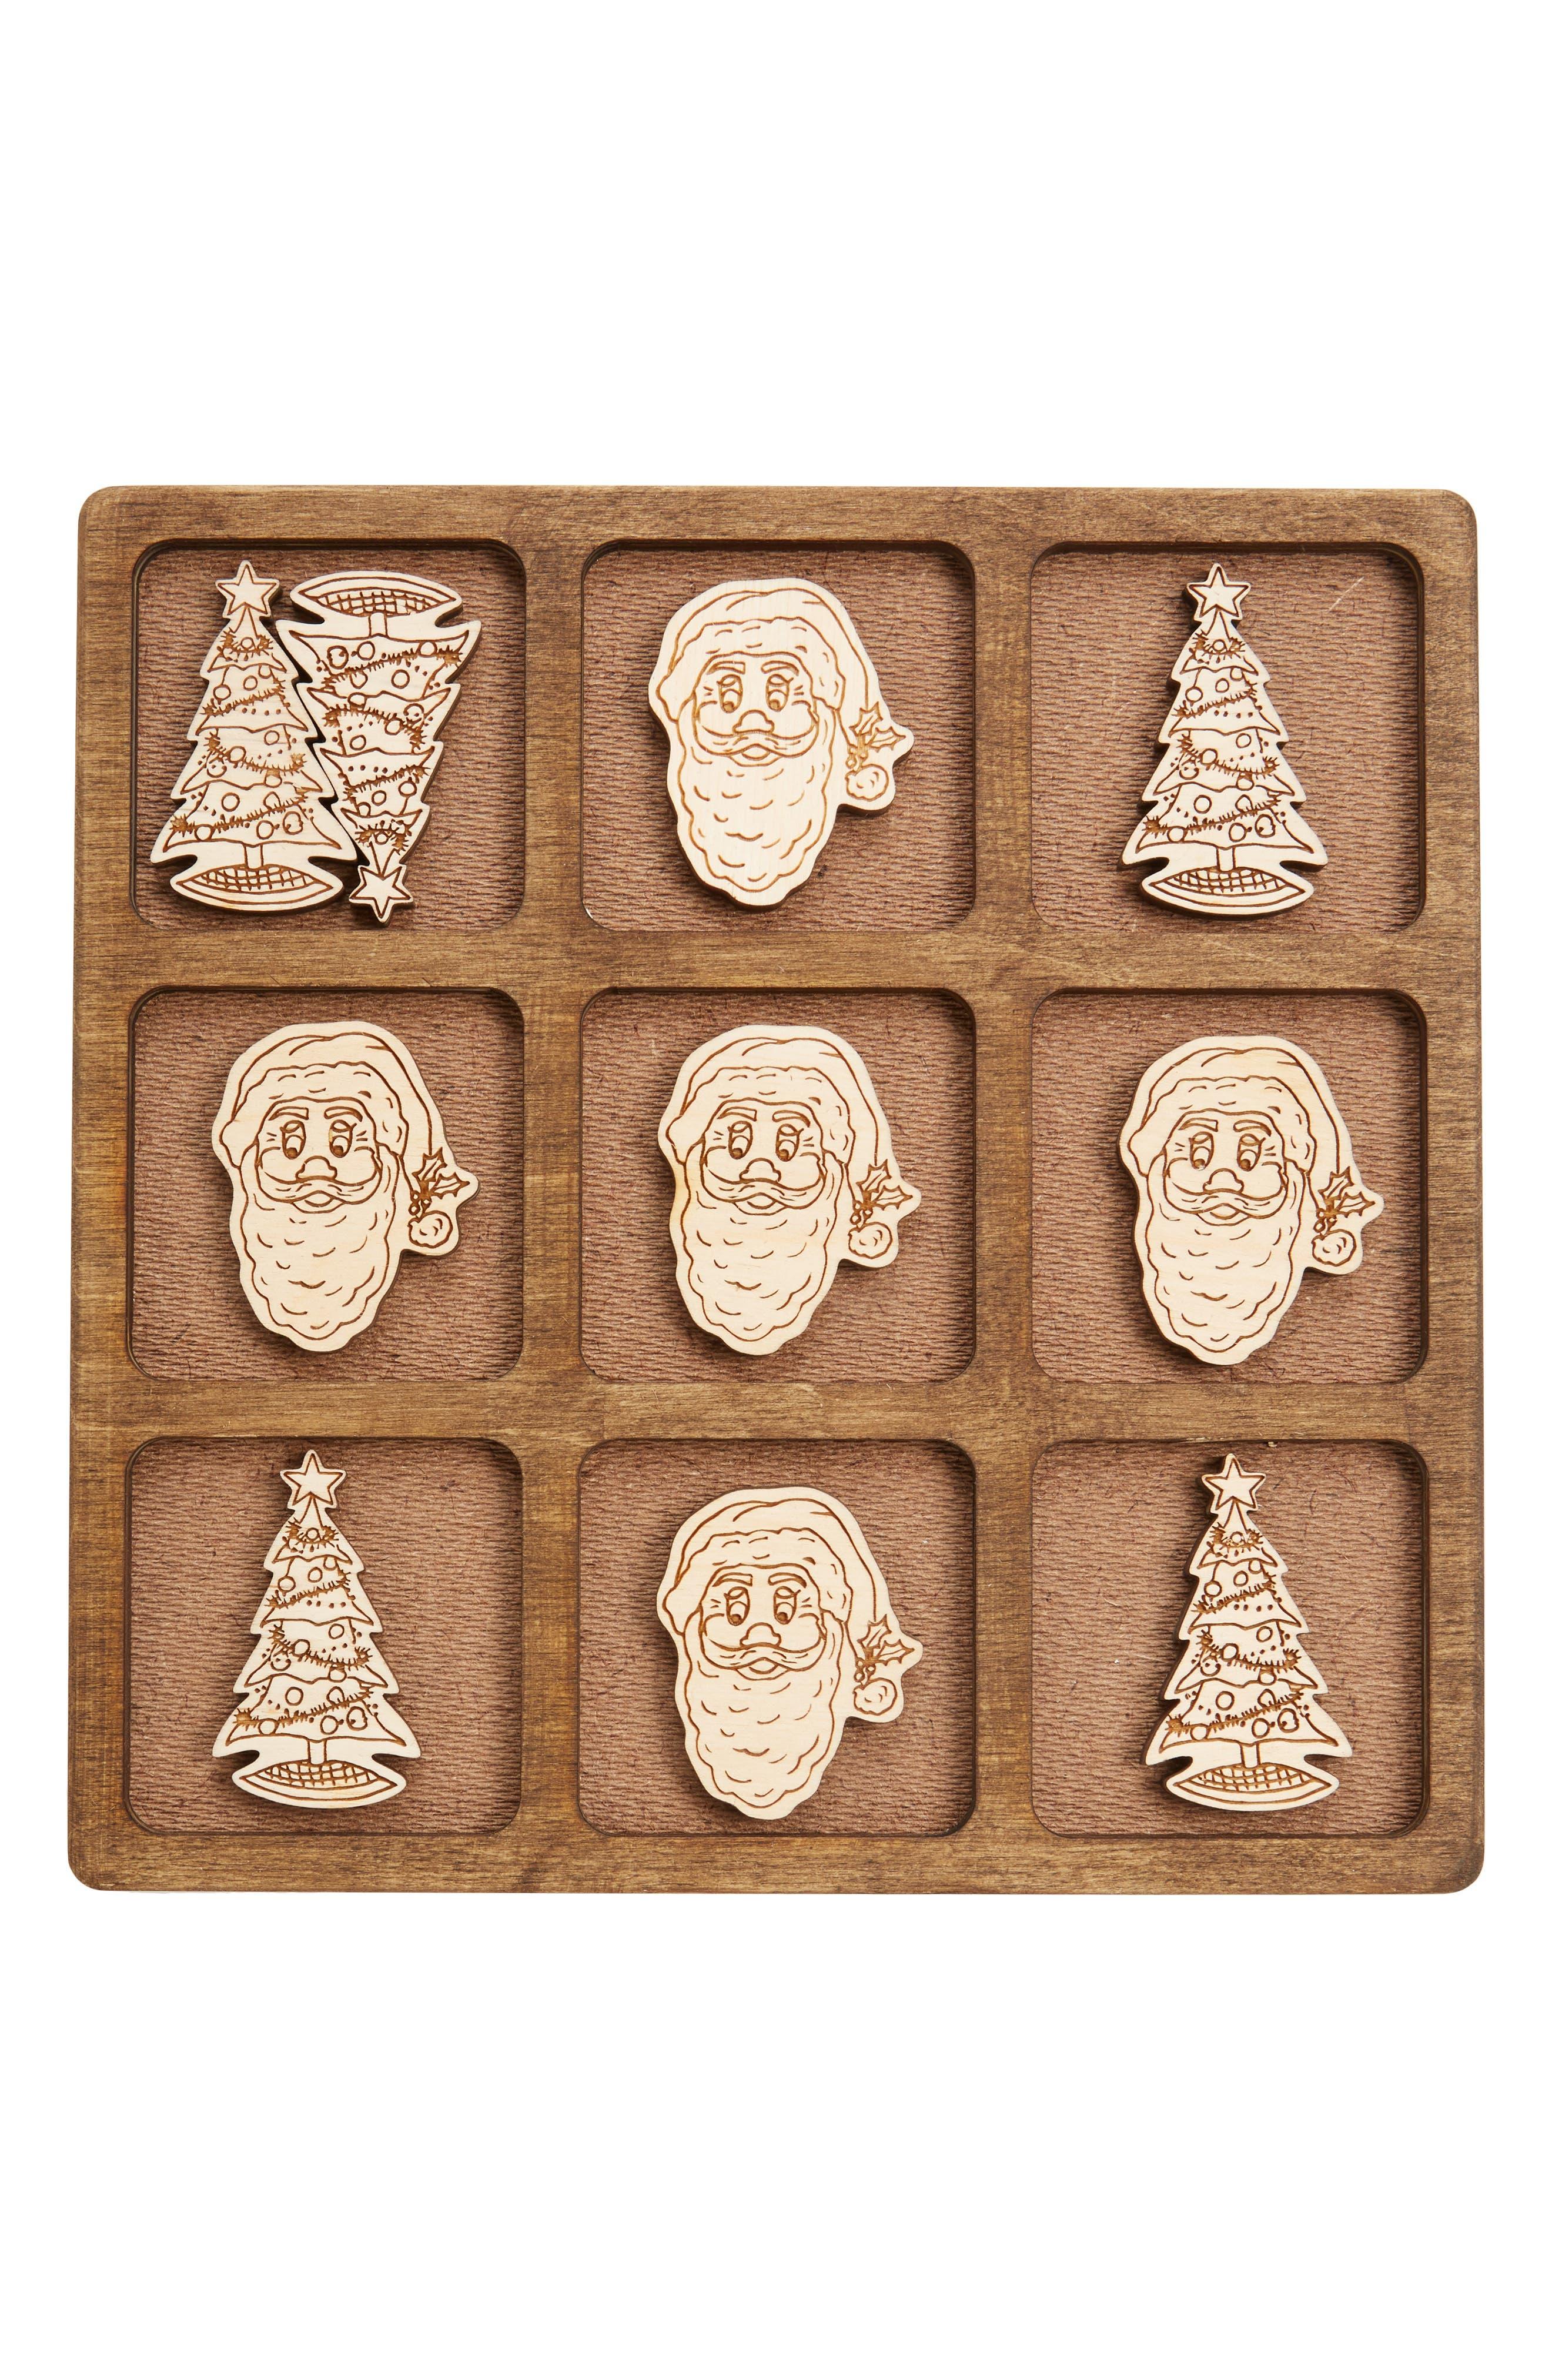 Toys 11-Piece Christmas Tic-Tac-Toe Game,                             Main thumbnail 1, color,                             250